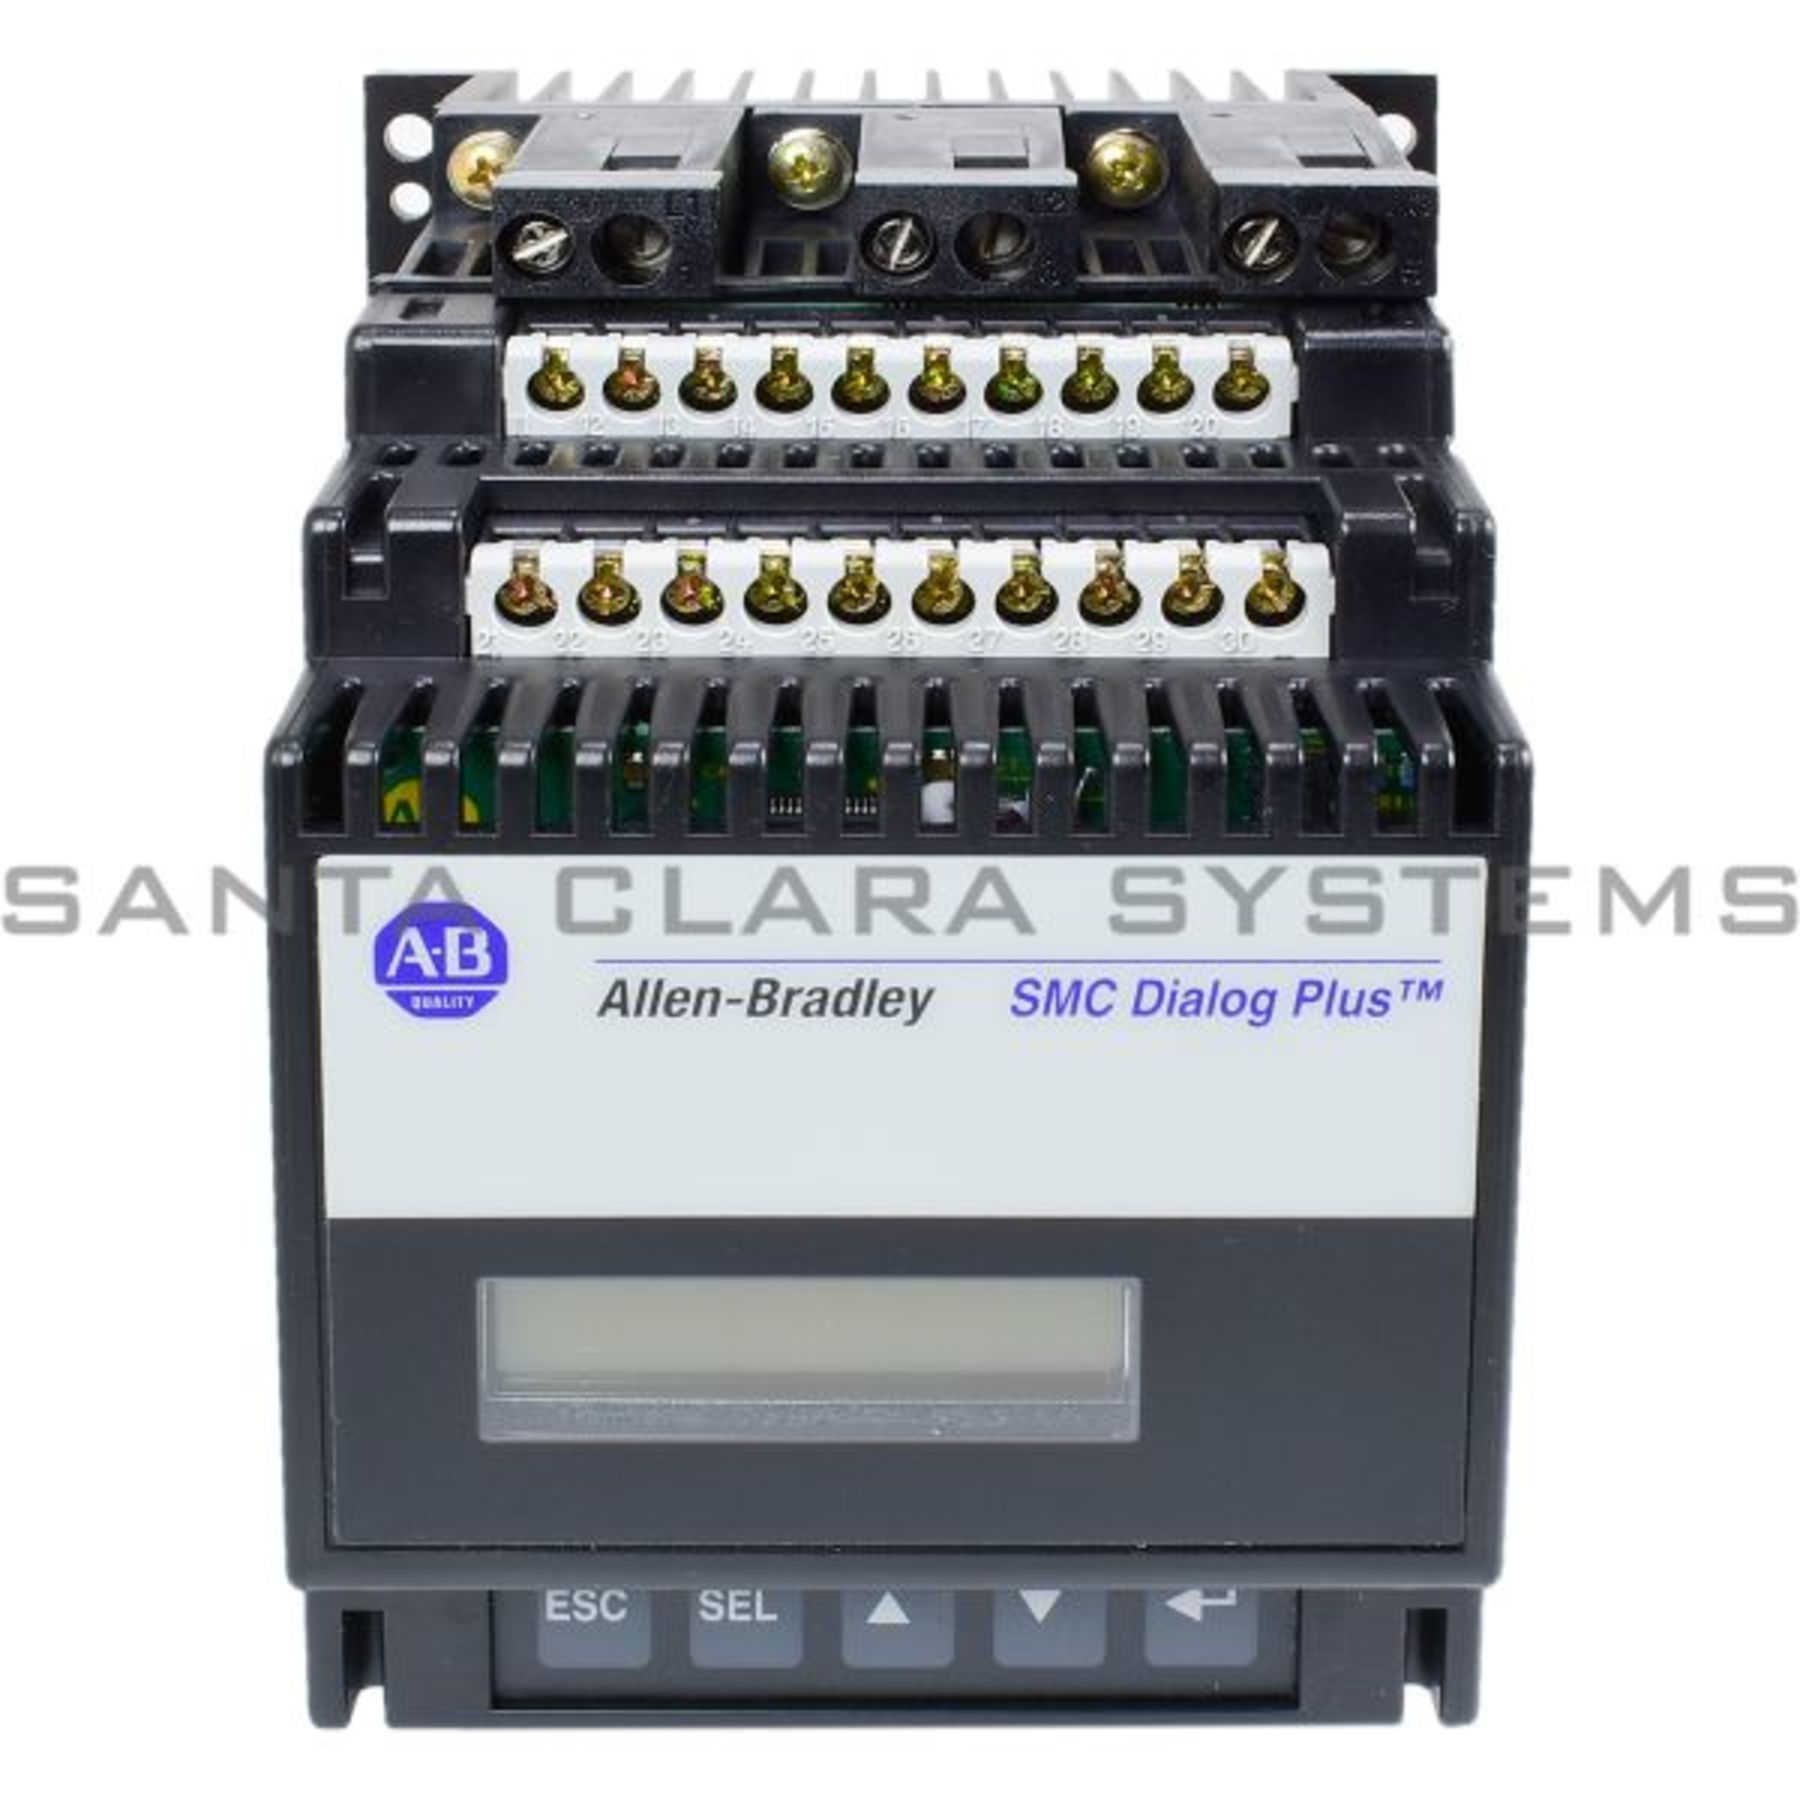 150-B24NBDD-J1 SMC Dialog Plus Controller In-Stock  Ships Today